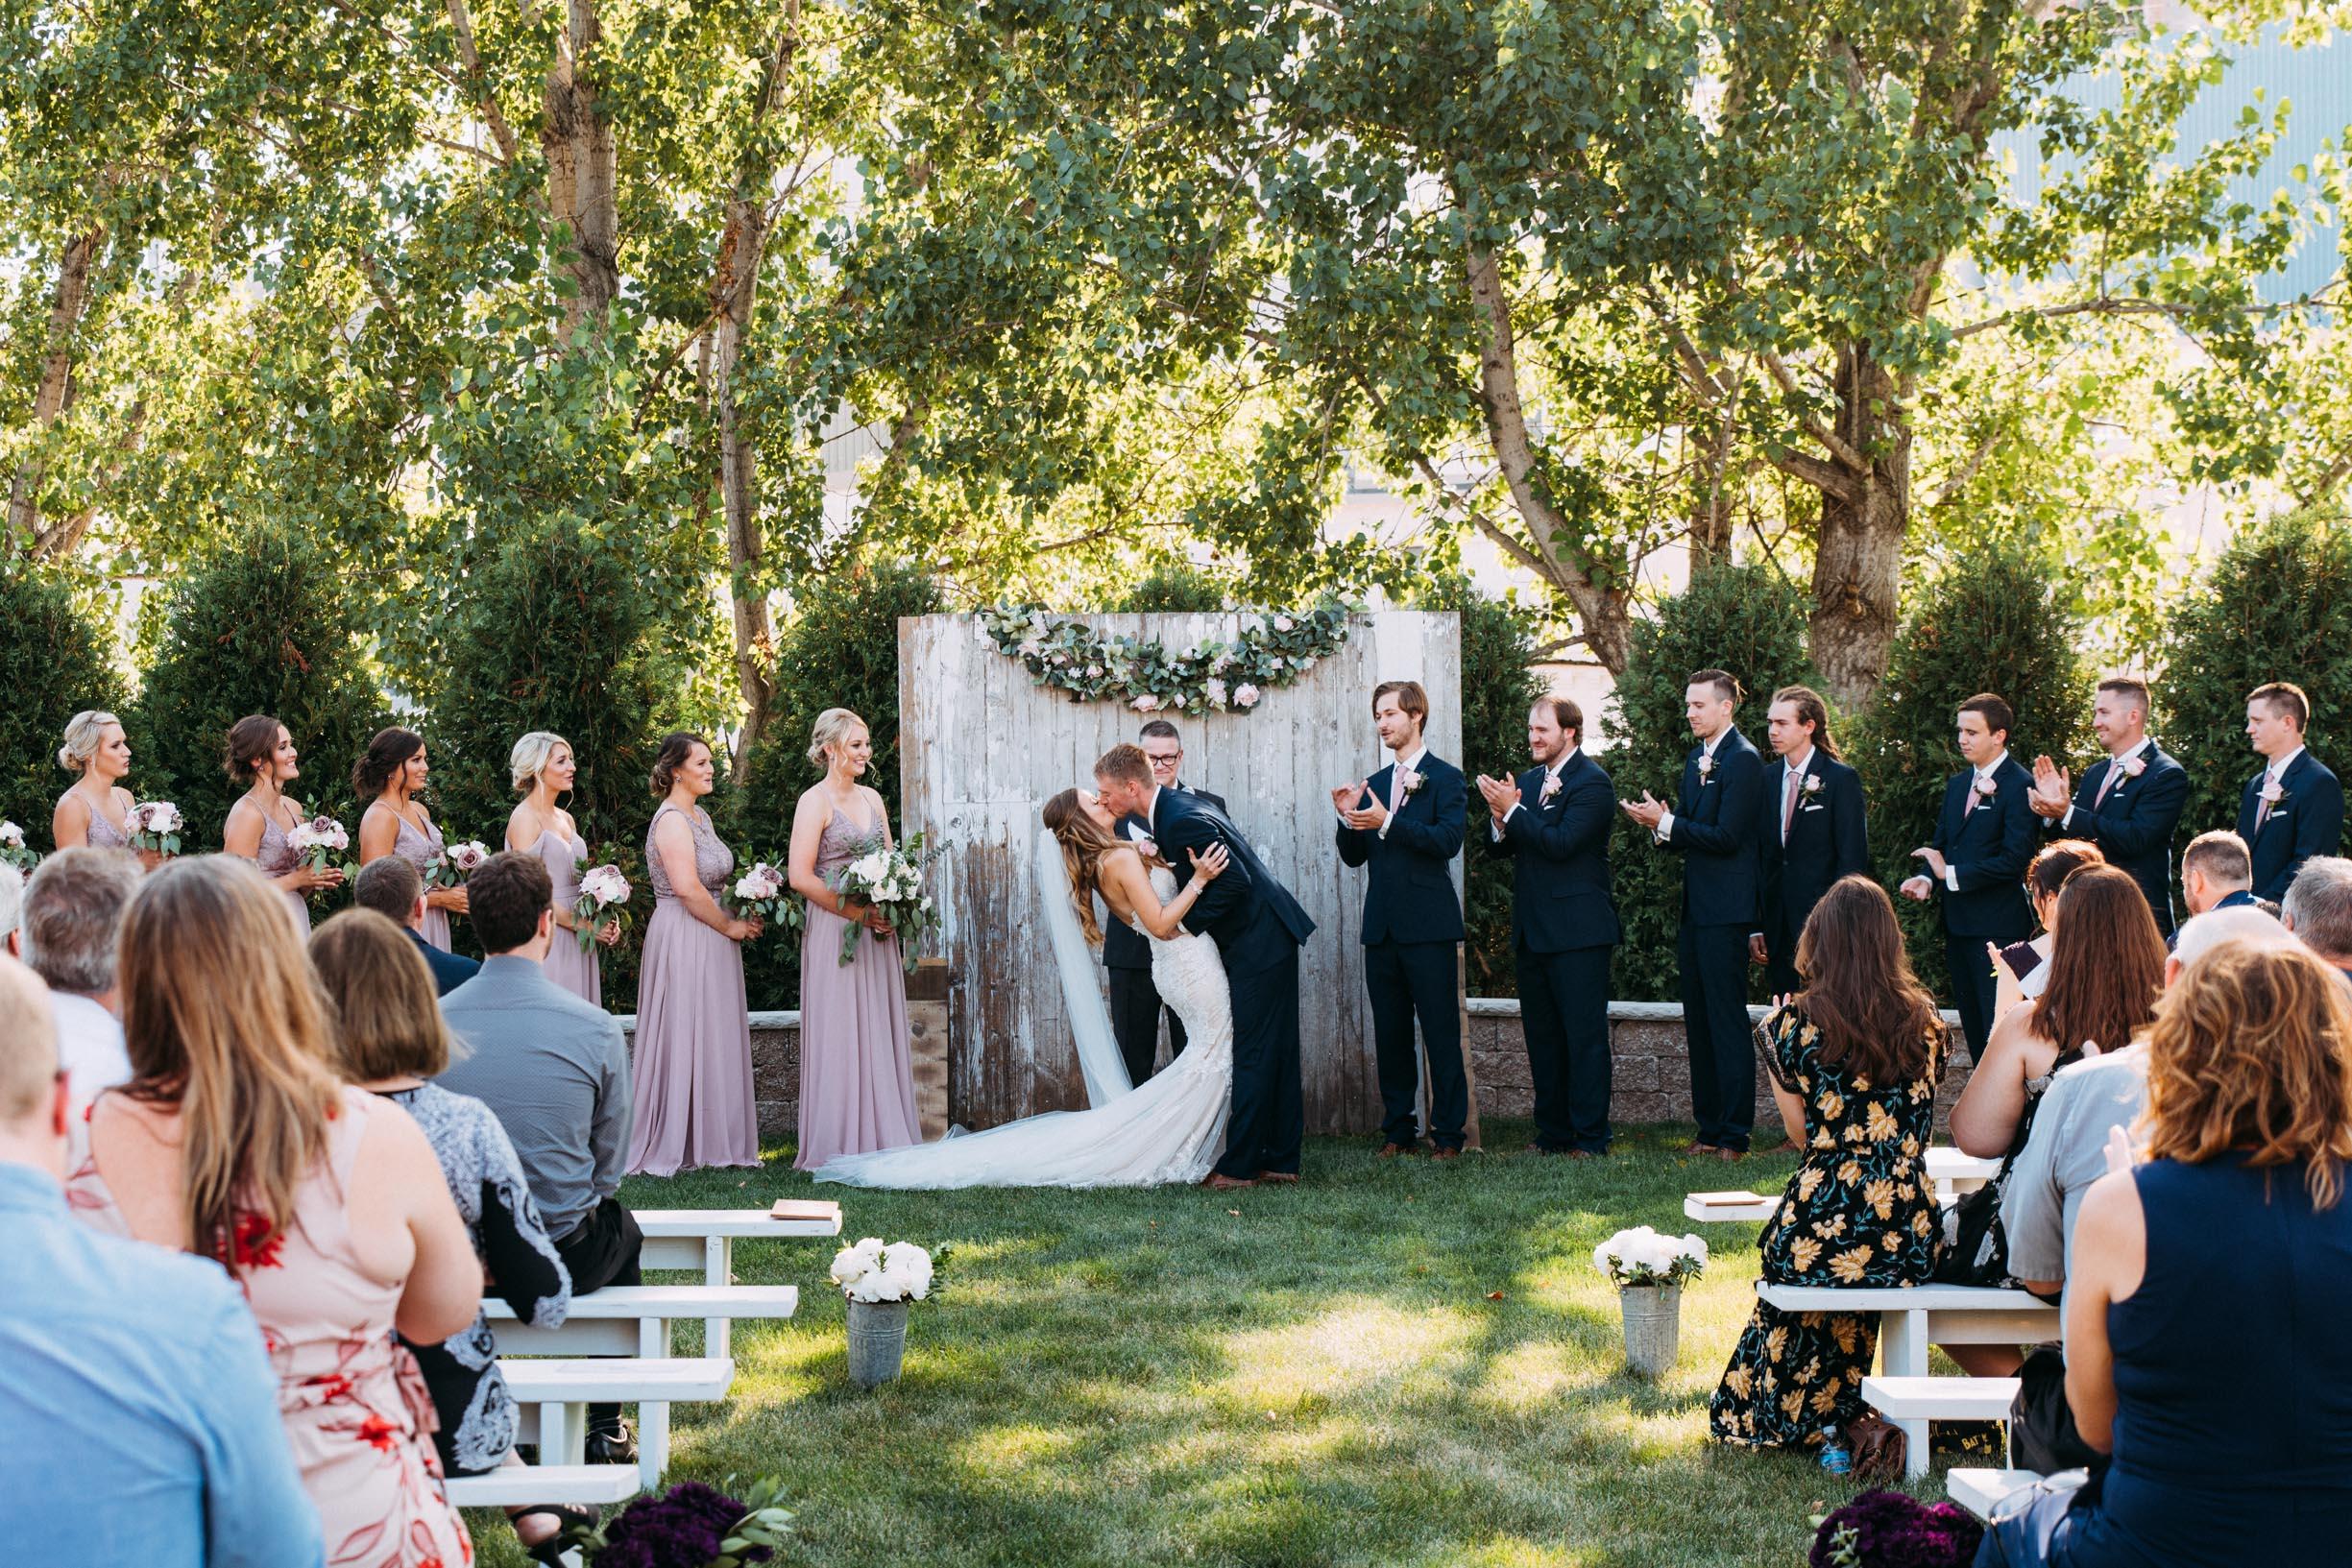 60-WeddingsattheBroz_Minnesota_WeddingBlog_Ceremony.jpg